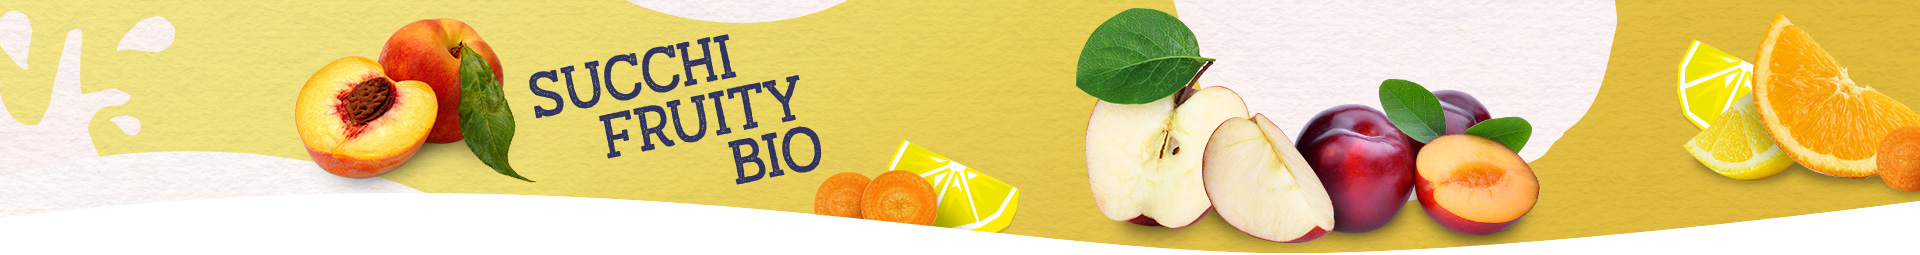 Fruity Bio